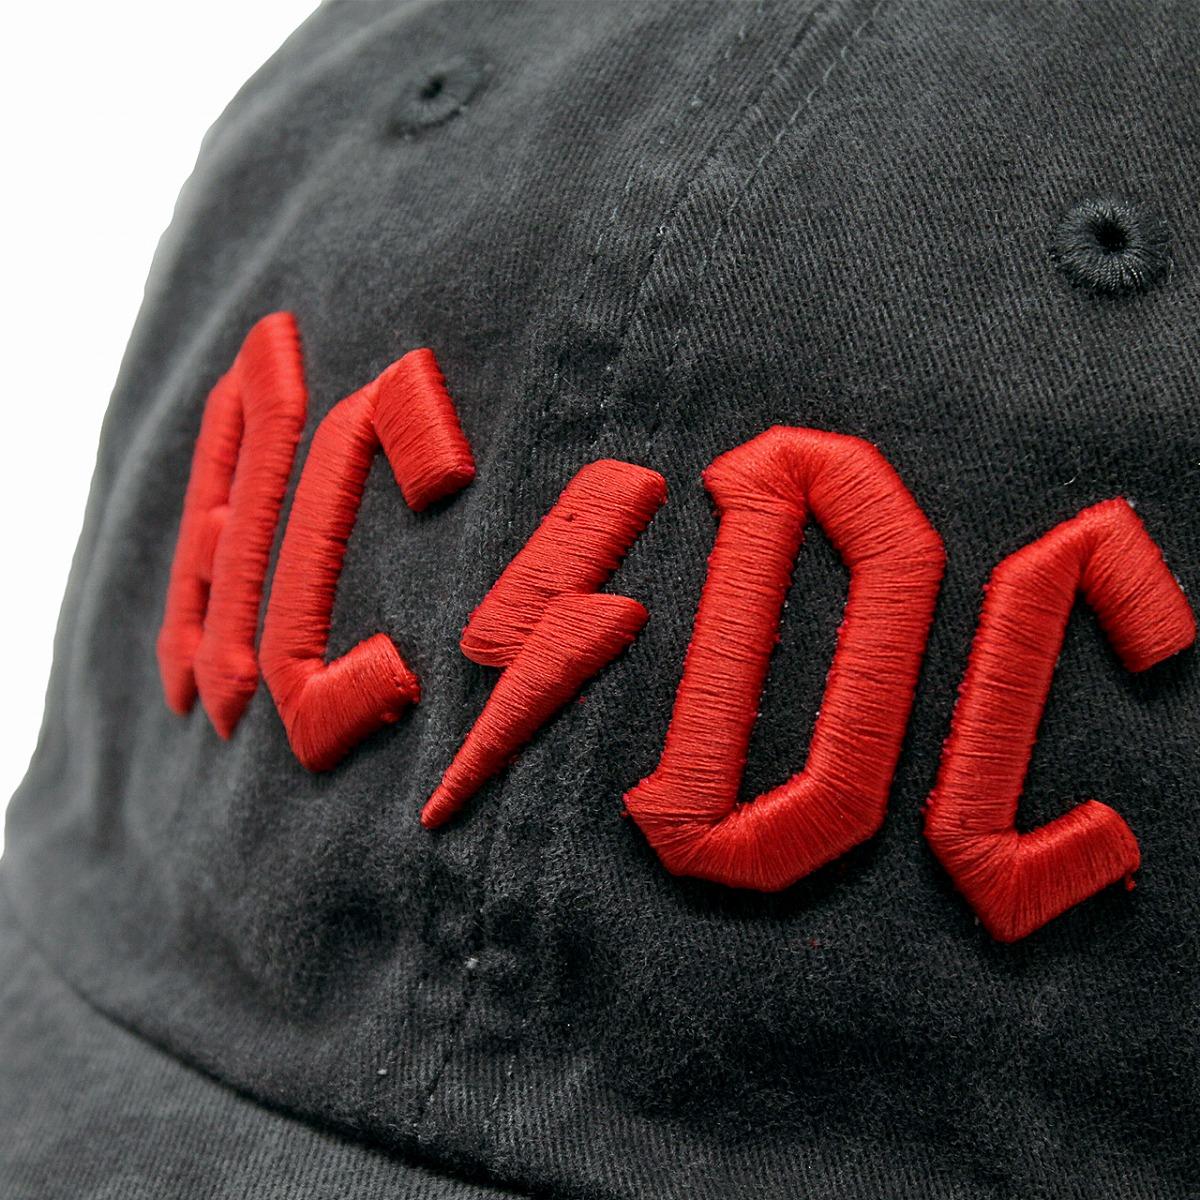 89f6c21d15741 Band cap ACDC cap oar season cotton men s American needle Lady s hat  AMERICAN NEEDLE AC DC black black